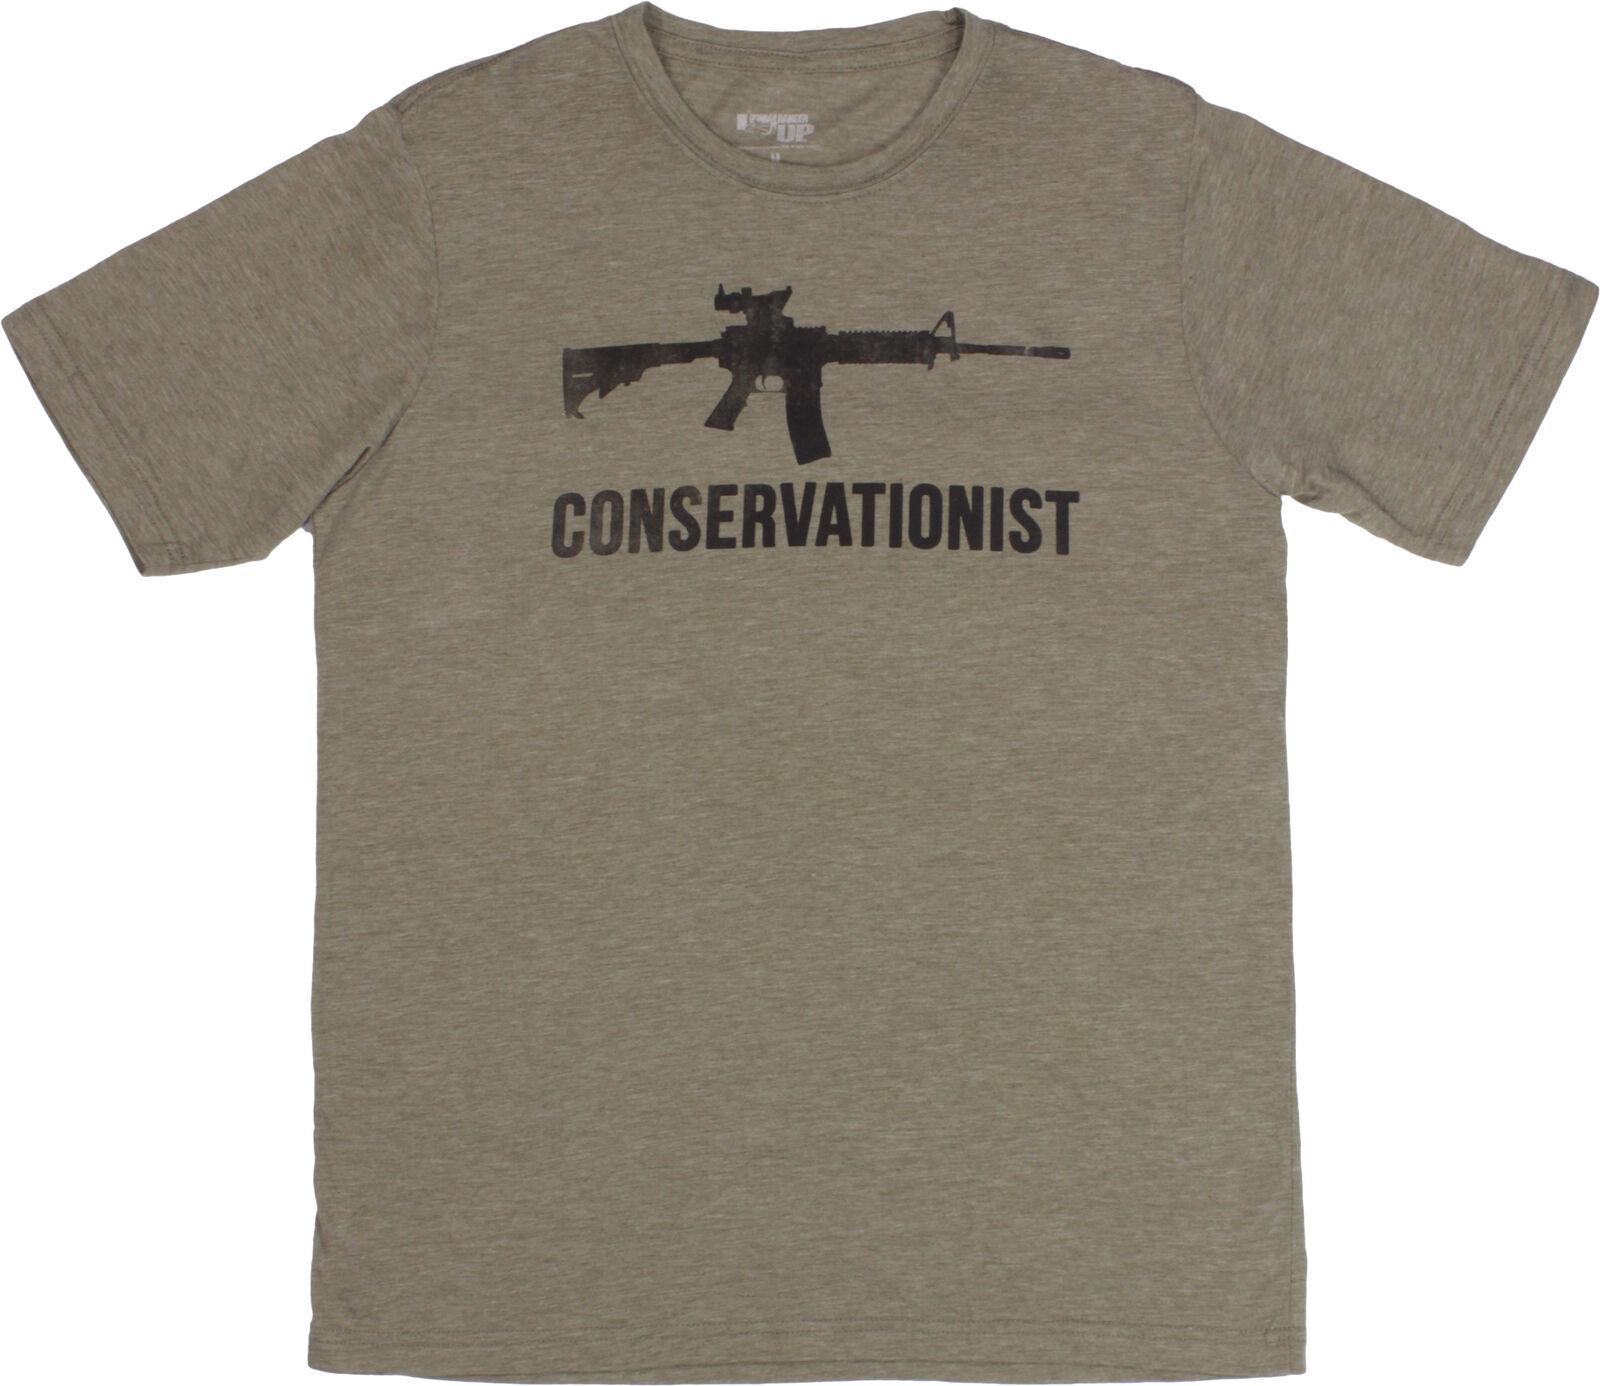 Ranger Up Mens Conservationist Military Veteran T- Shirt - Olive Green